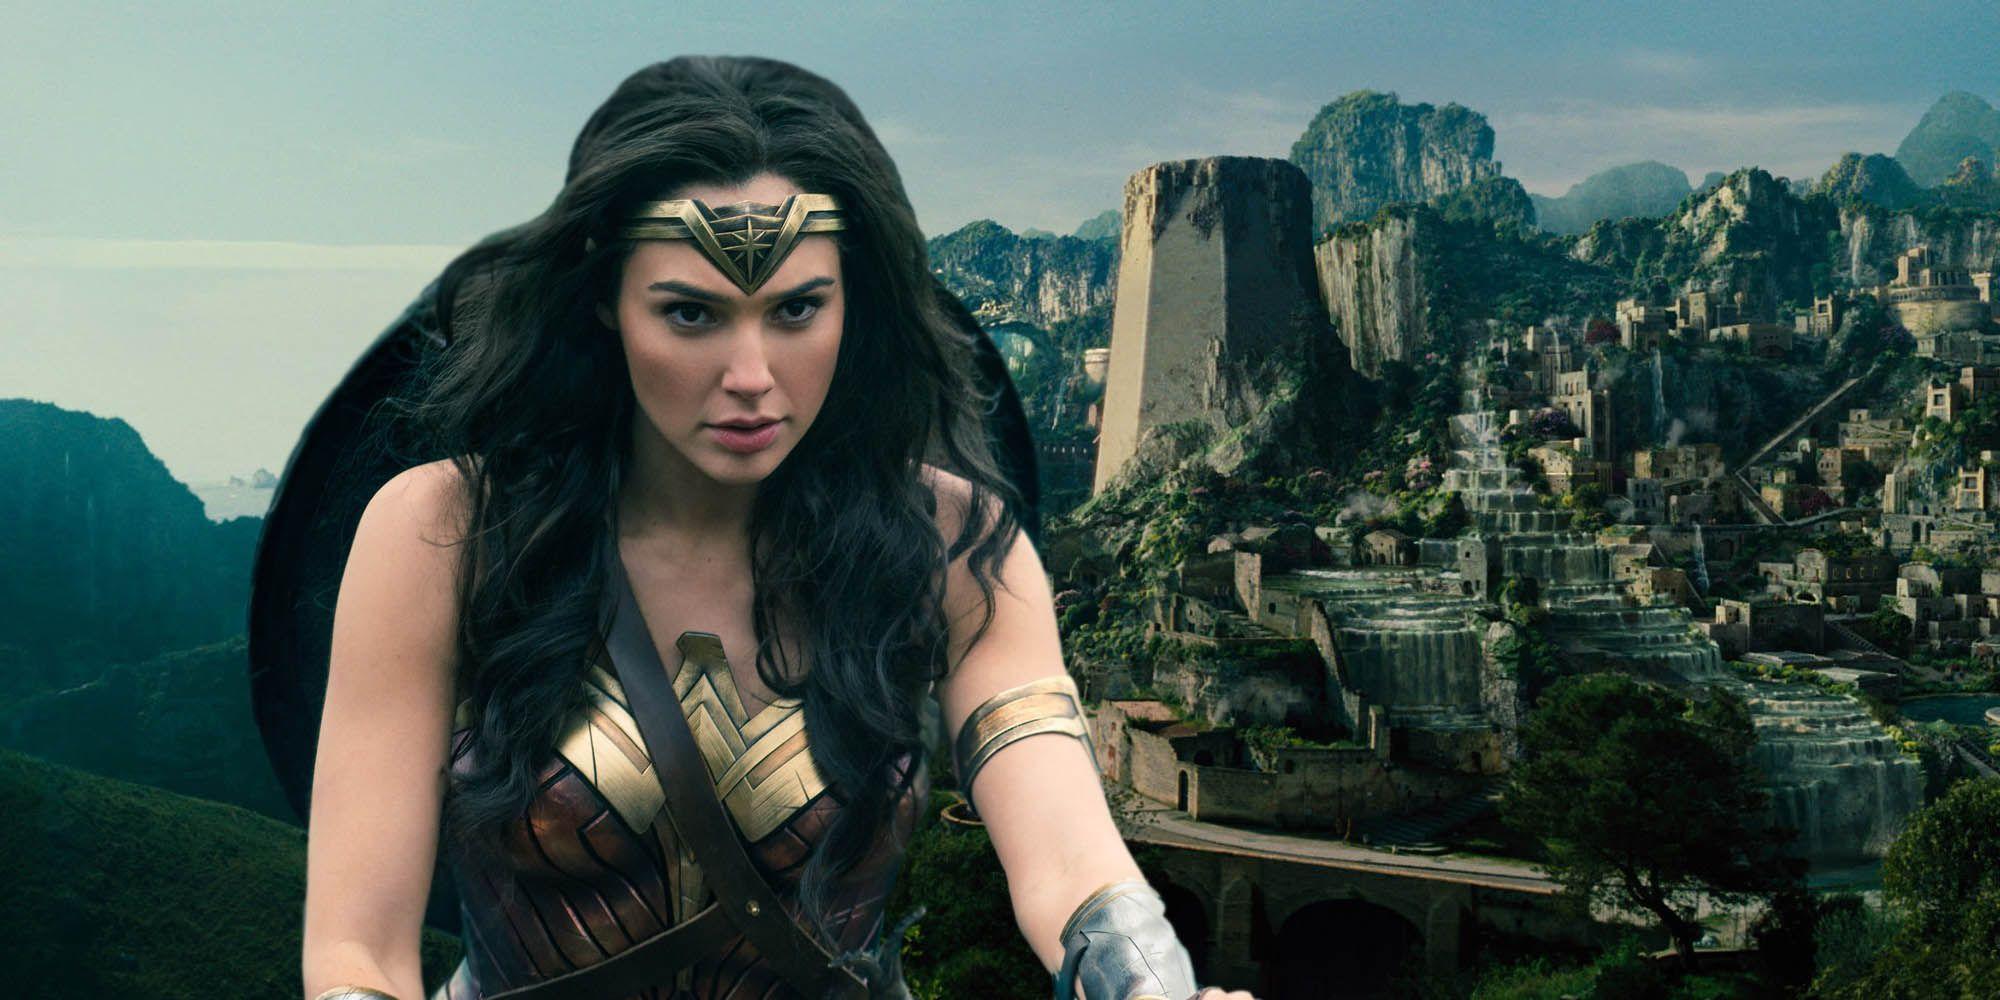 Wallpaper Wonder Woman Gal Gadot Hd 4k 2017 Movies 2361: New Wonder Woman Movie Stills Released